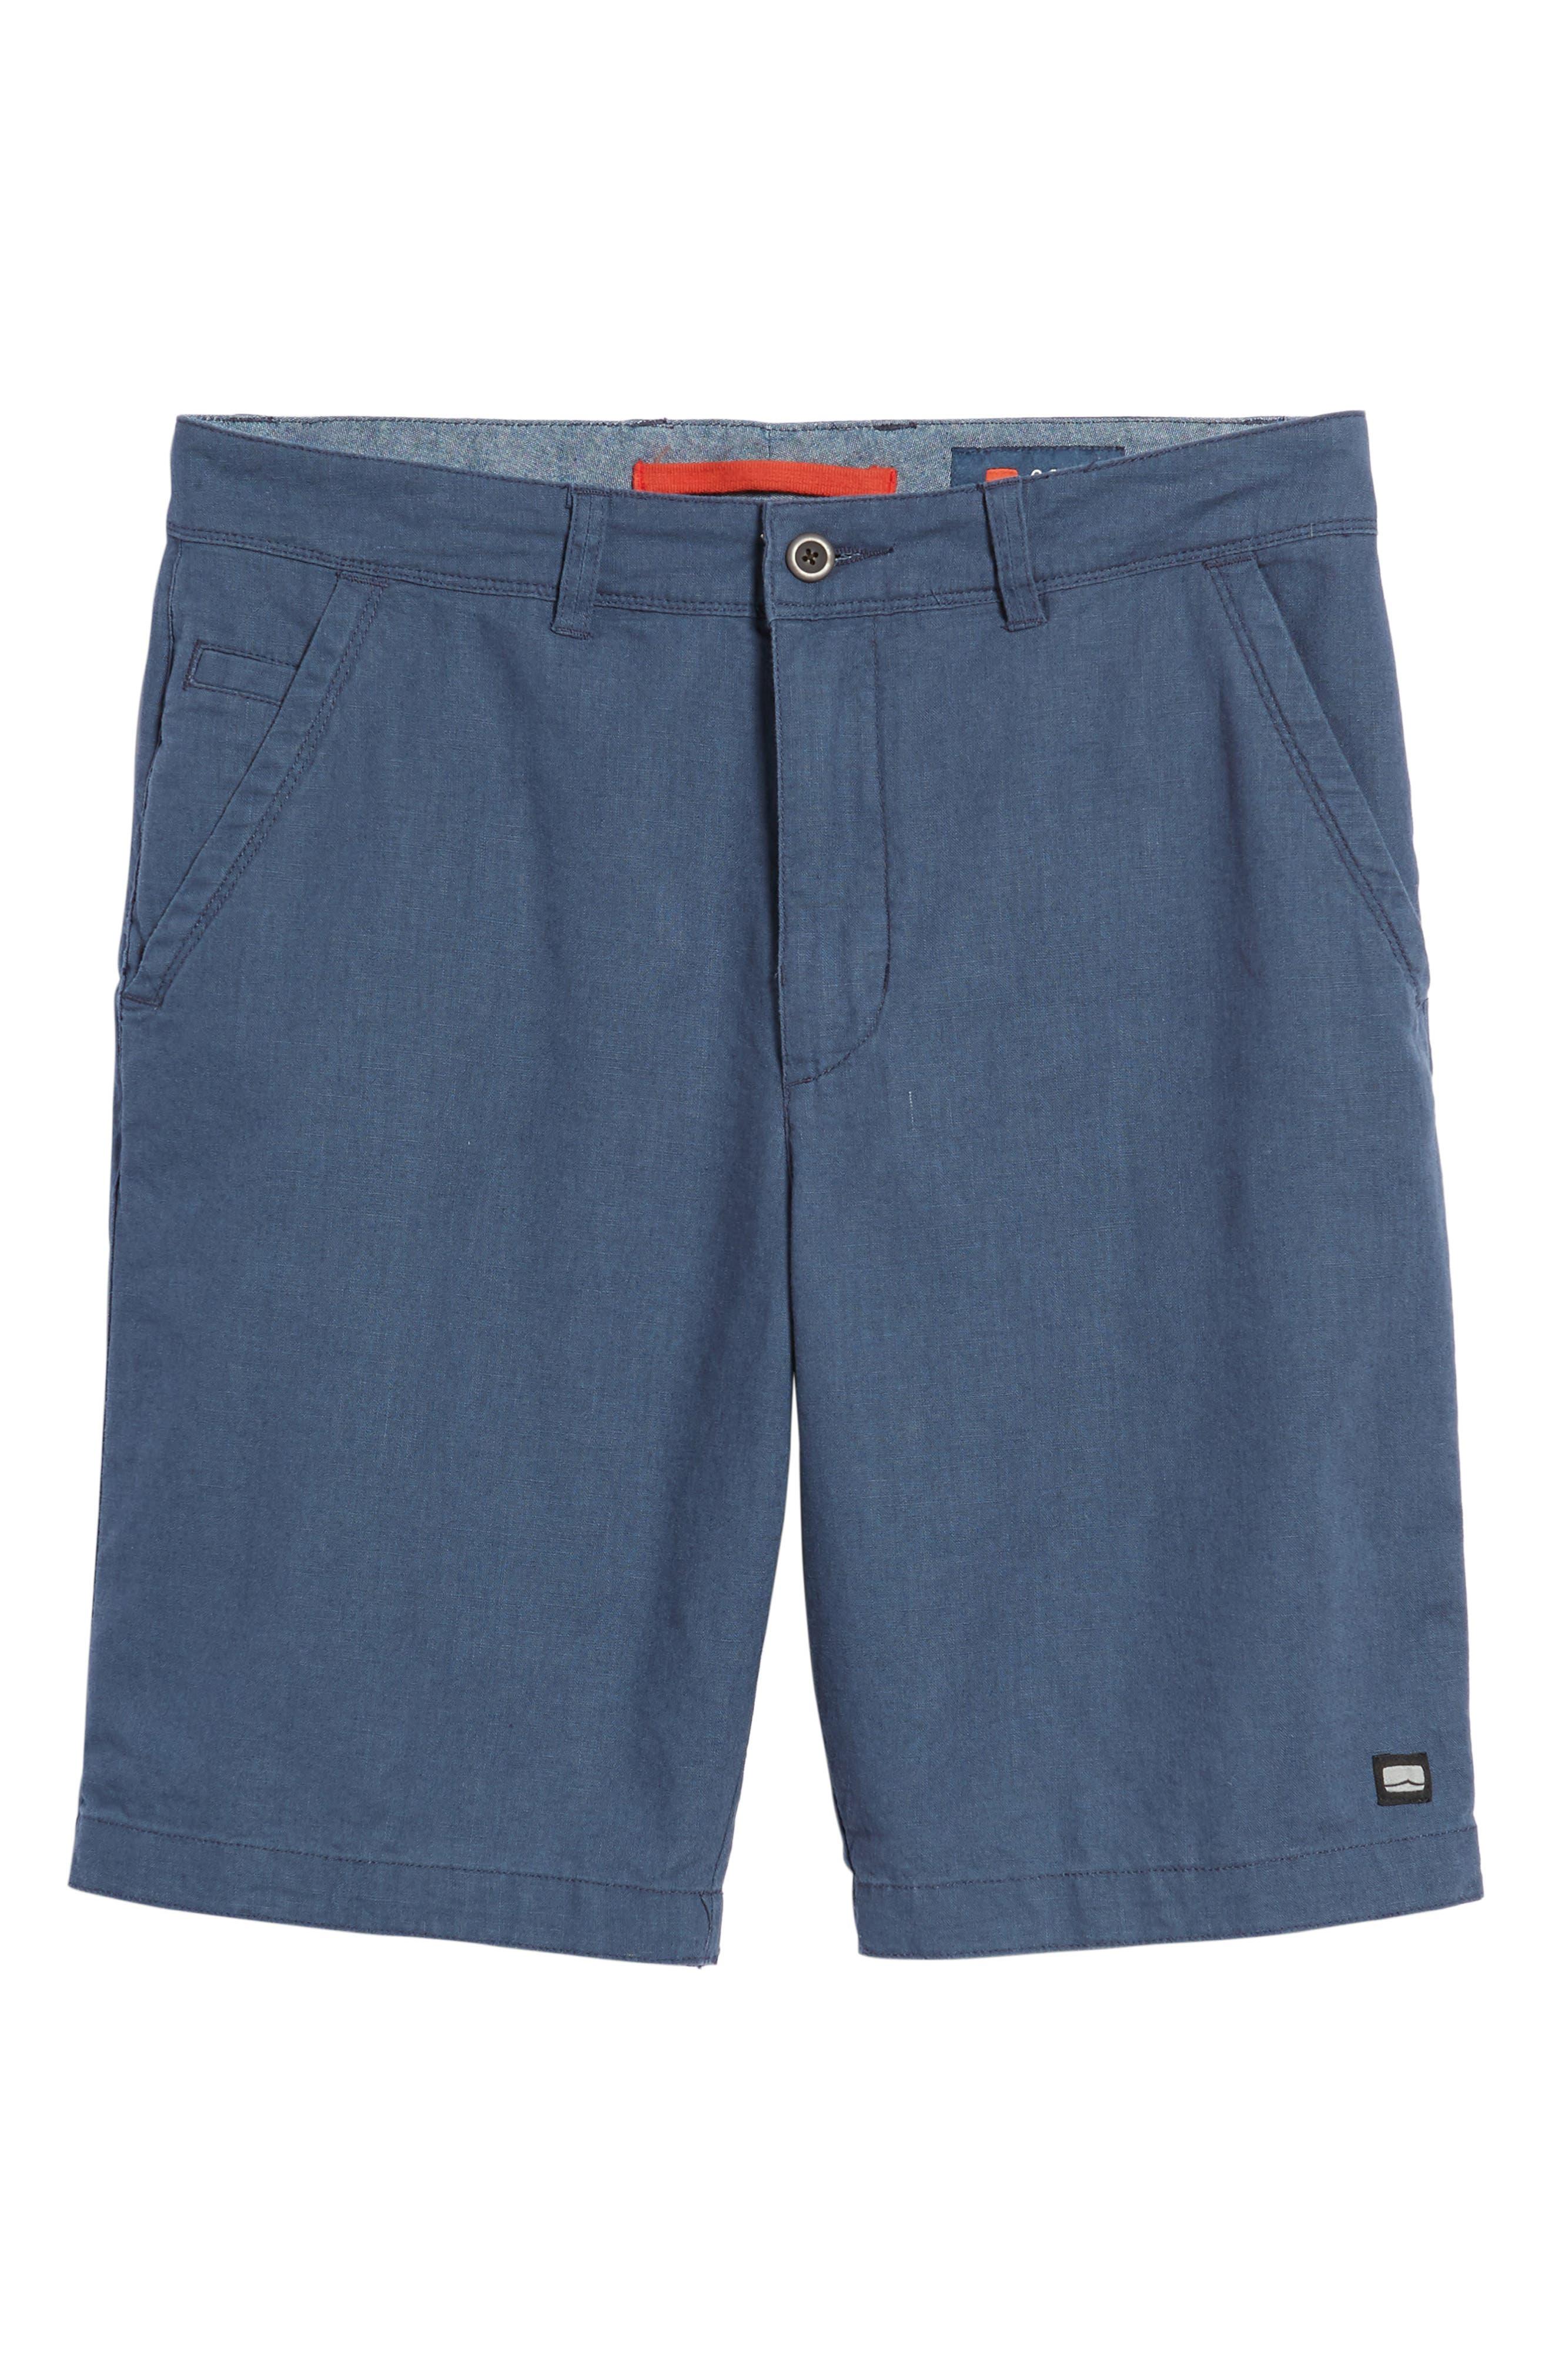 Islander Linen & Cotton Shorts,                             Alternate thumbnail 6, color,                             410